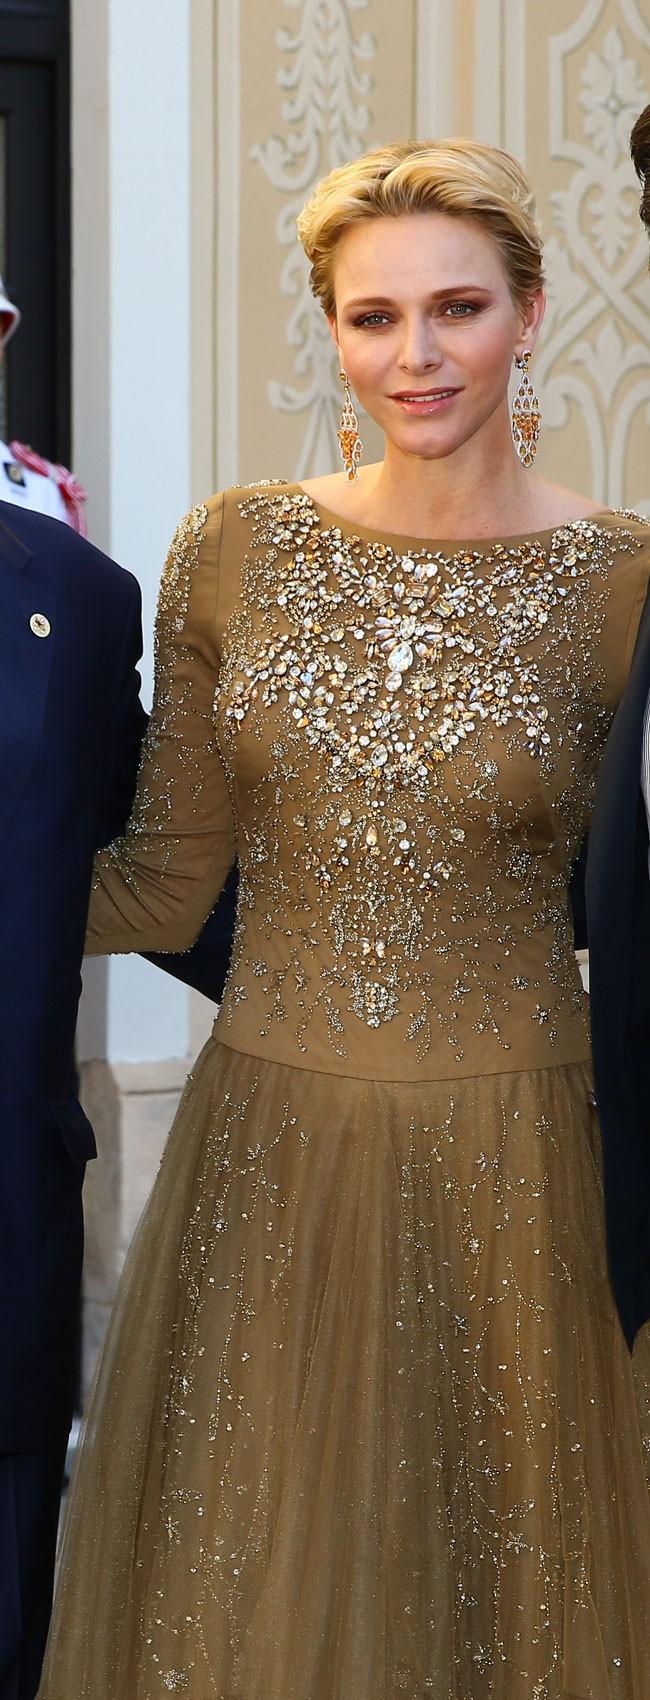 Charlene de Mónaco eligió un diseño de Ralph Lauren.